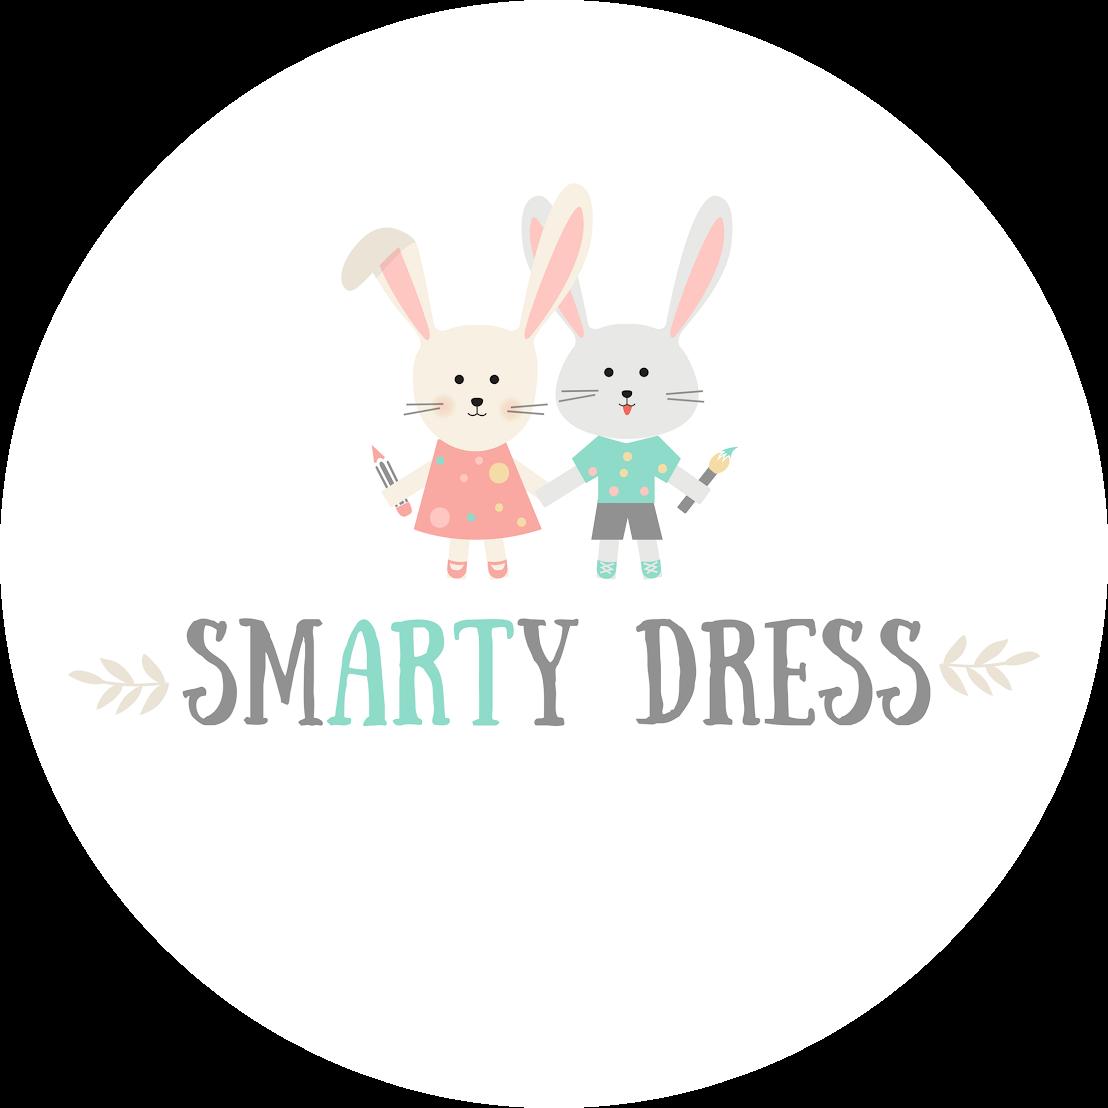 Smarty Dress